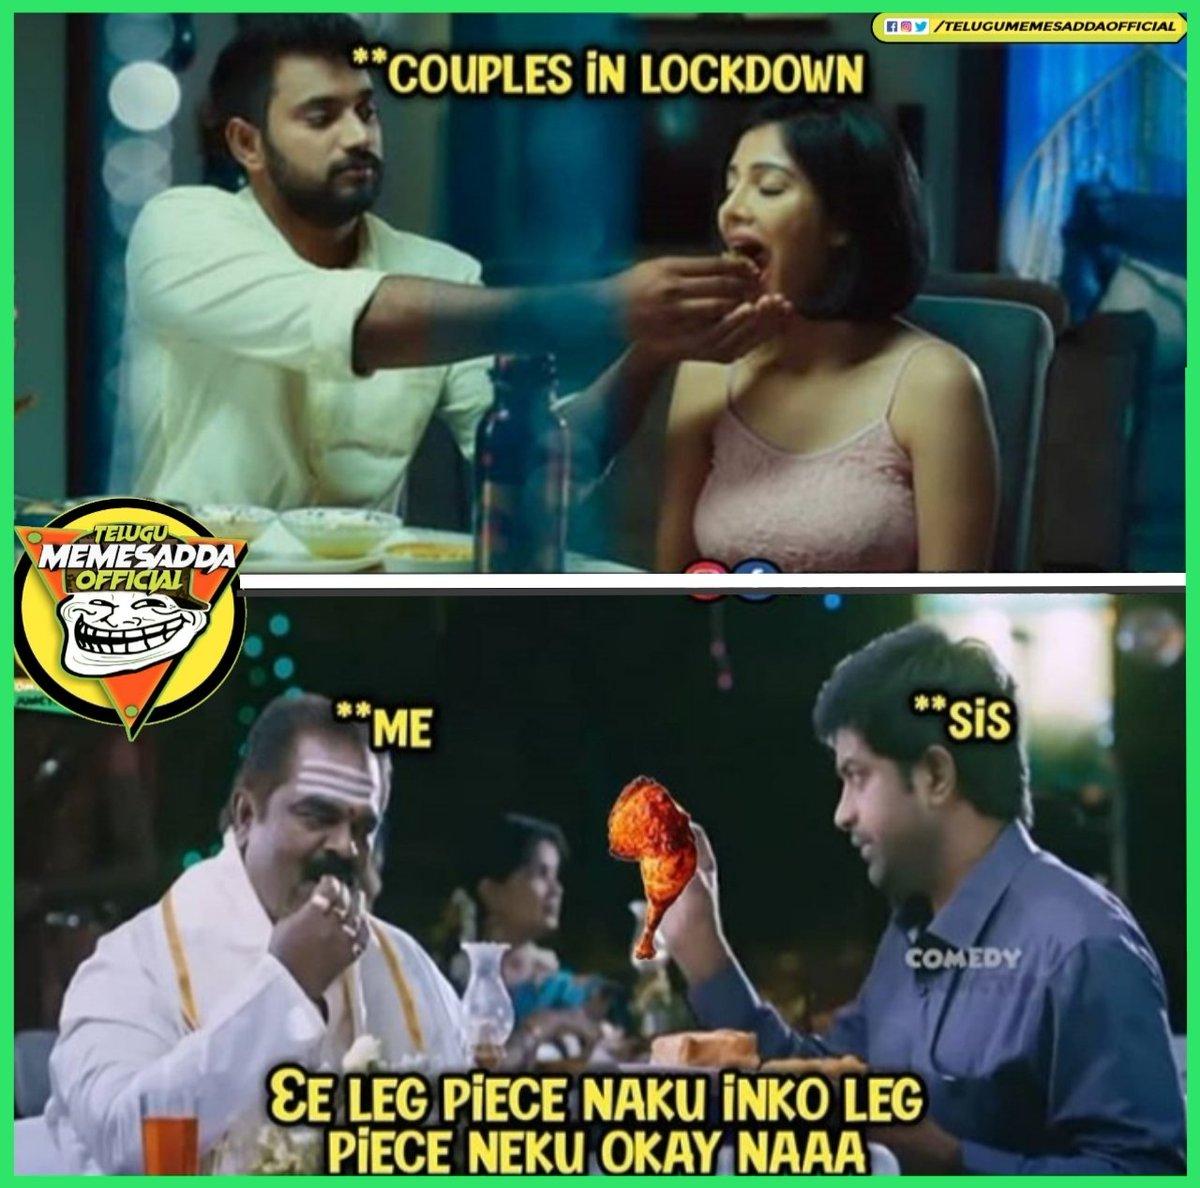 FOLLOW & SHARE  *TeluguMemesAddaOfficial.*  For More Entertainment And Updates  #vijaydevarakonda,#Maheshbabu,#Pawankalyan,#unprofessionaltrollers,#telugudubsmash,#rashmikamadanna,#Anupamaparameswaran,#Prabhas,#Alluarjun,#nani,#kajalagarwal,#keerthisuresh,#poojahedgepic.twitter.com/xqPp1LTuv5